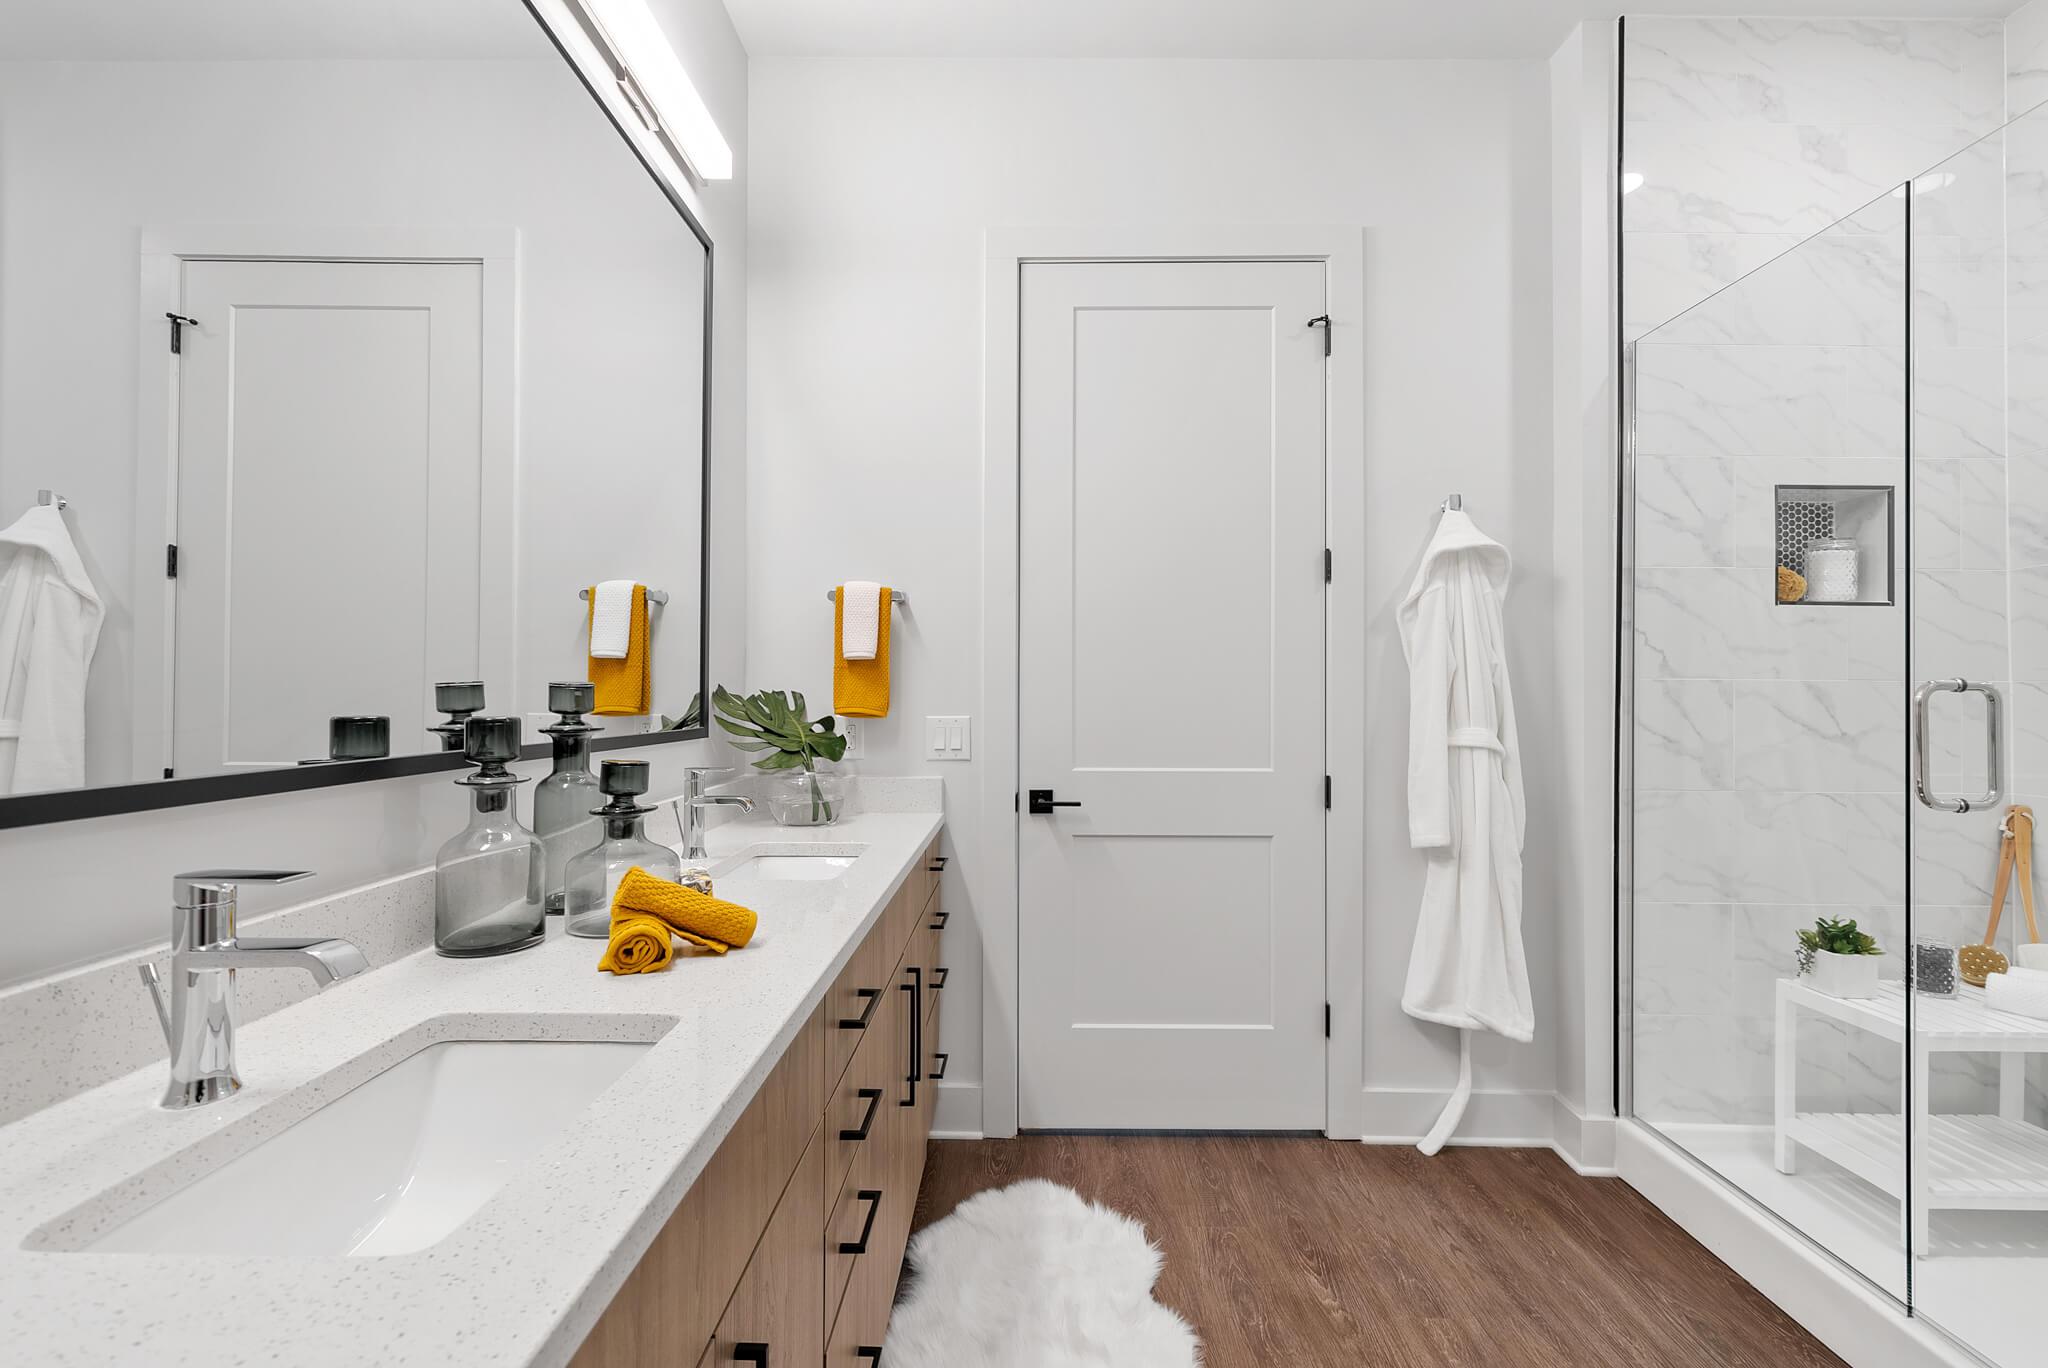 Bathroom with Glass-surround Shower